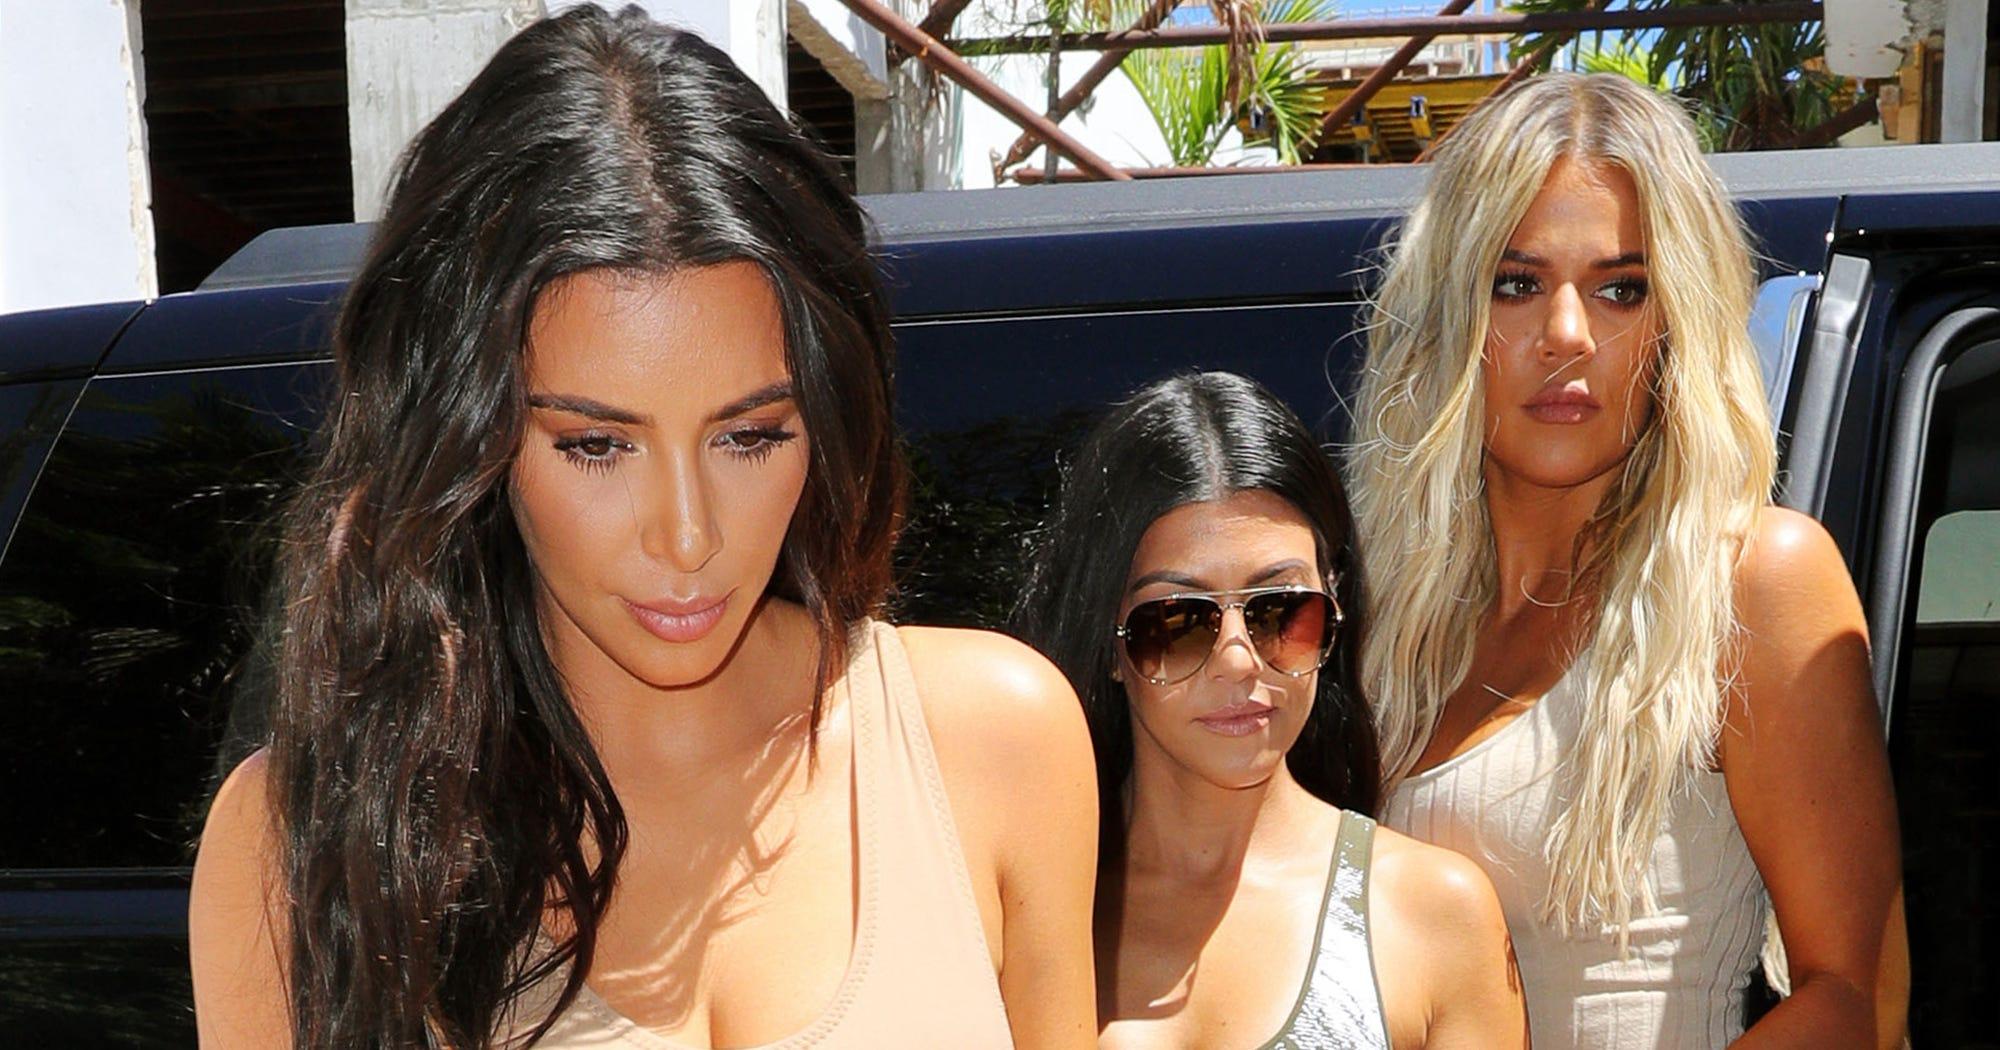 The Reason Behind Kim And Kourtney Kardashian's Dramatic Fight